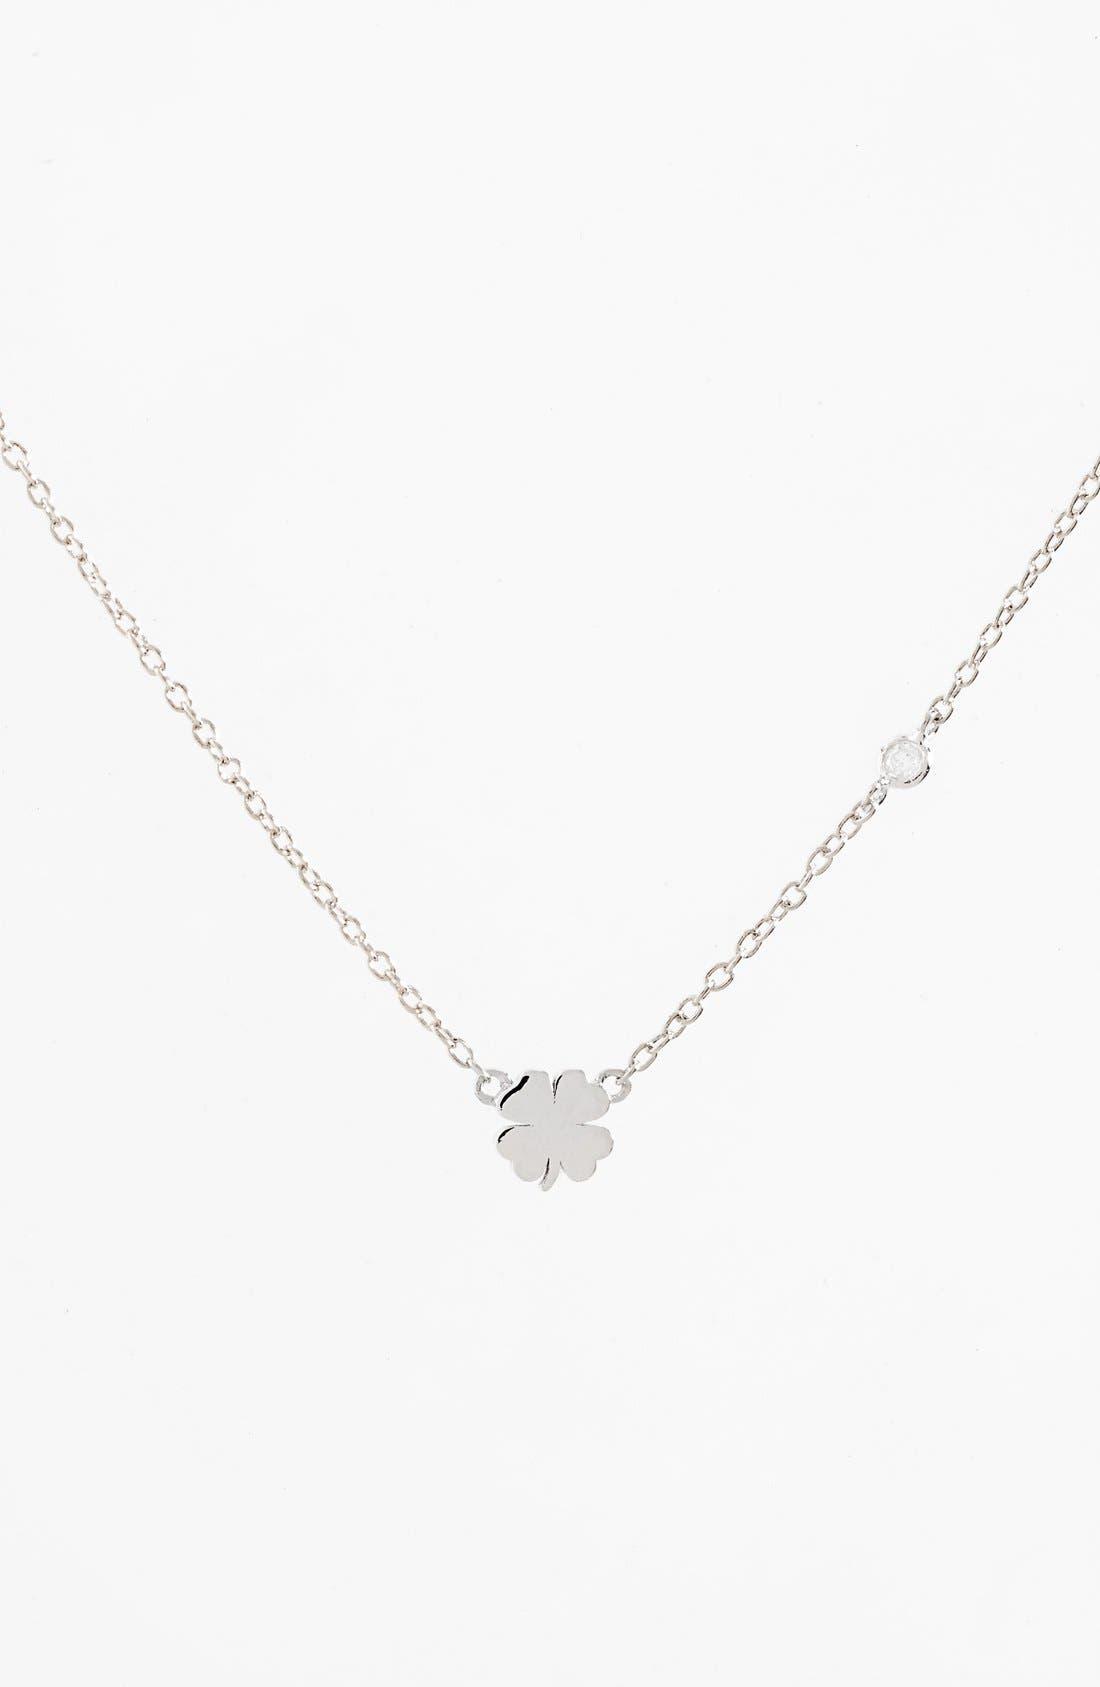 Clover Necklace,                         Main,                         color, Silver